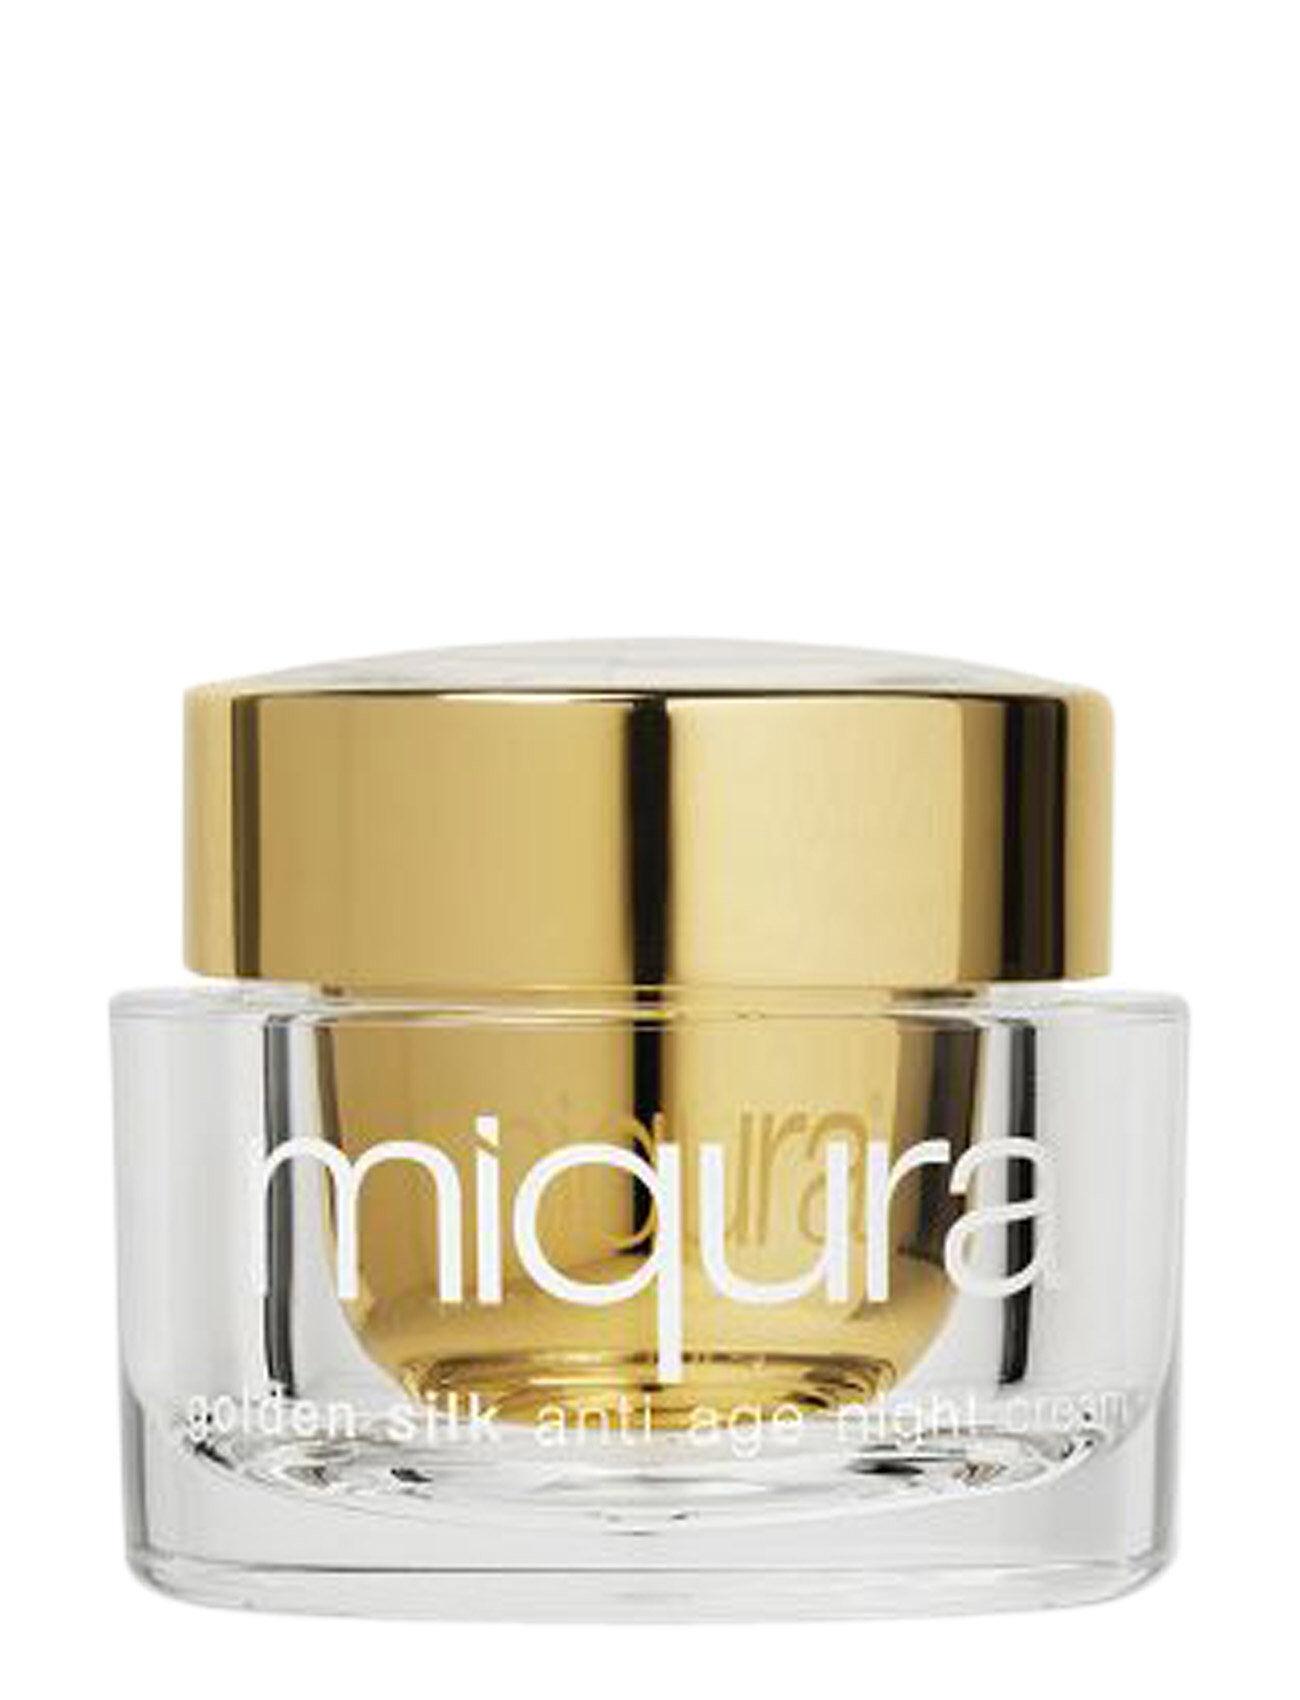 Miqura Premium Hand Mask Box Beauty WOMEN Skin Care Body Hand Cream & Foot Cream Nude Miqura